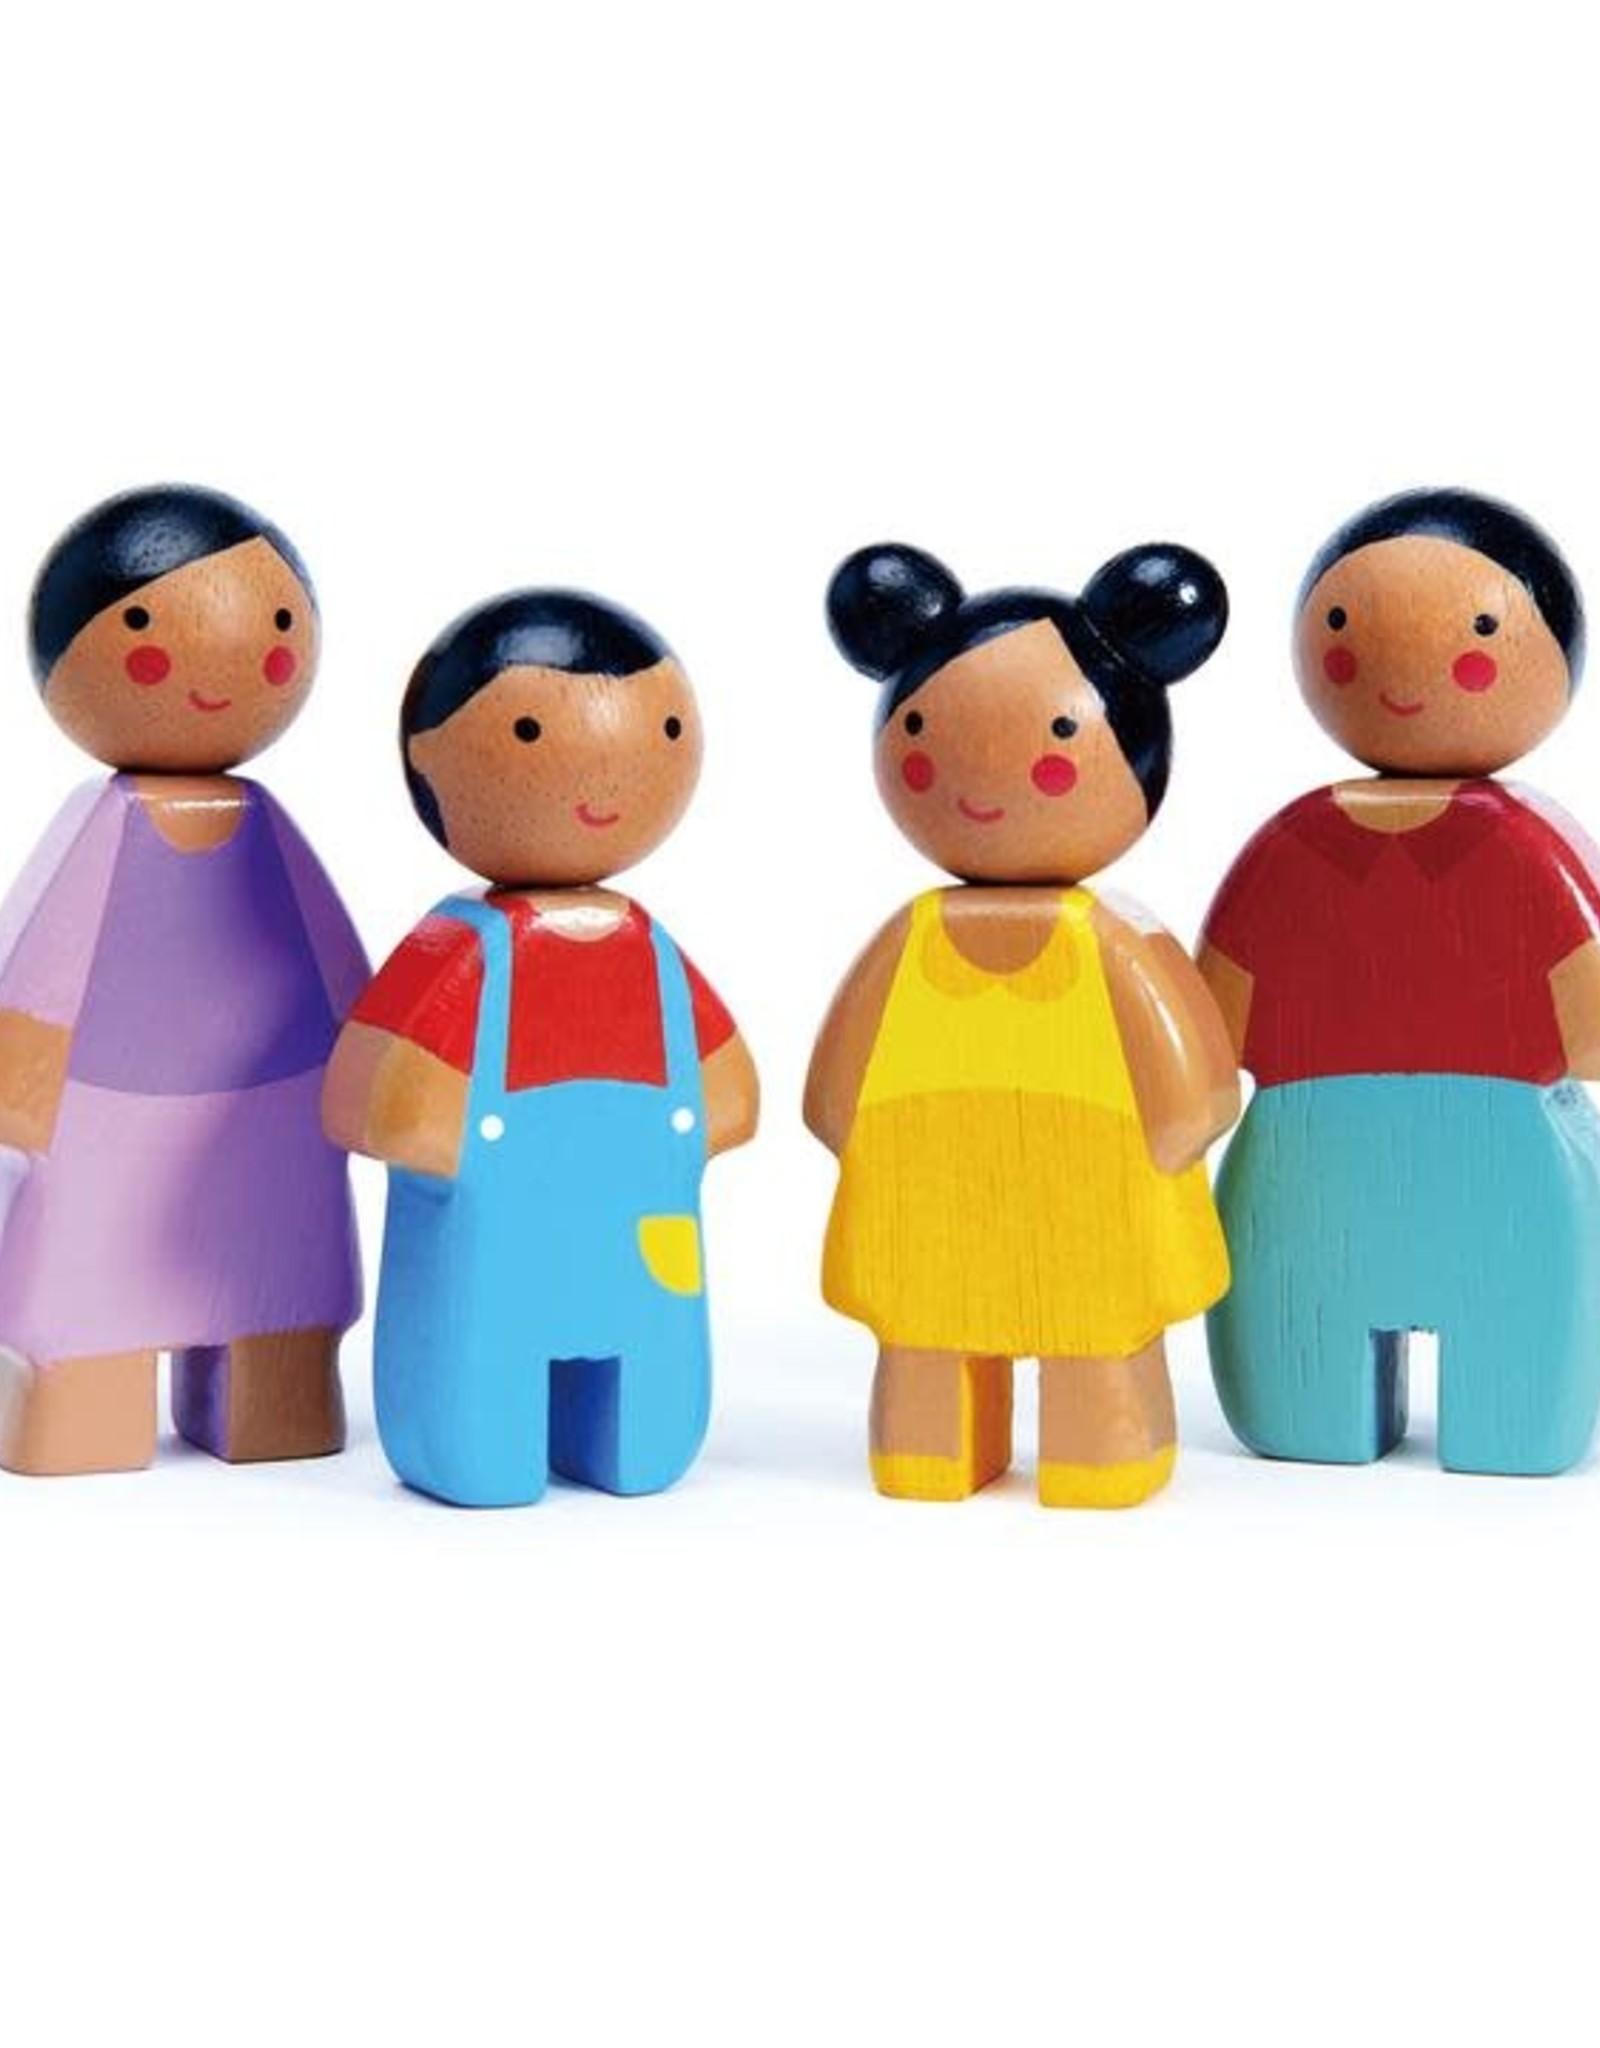 Tender Leaf Toys Sunny Doll Family Wooden Dolls